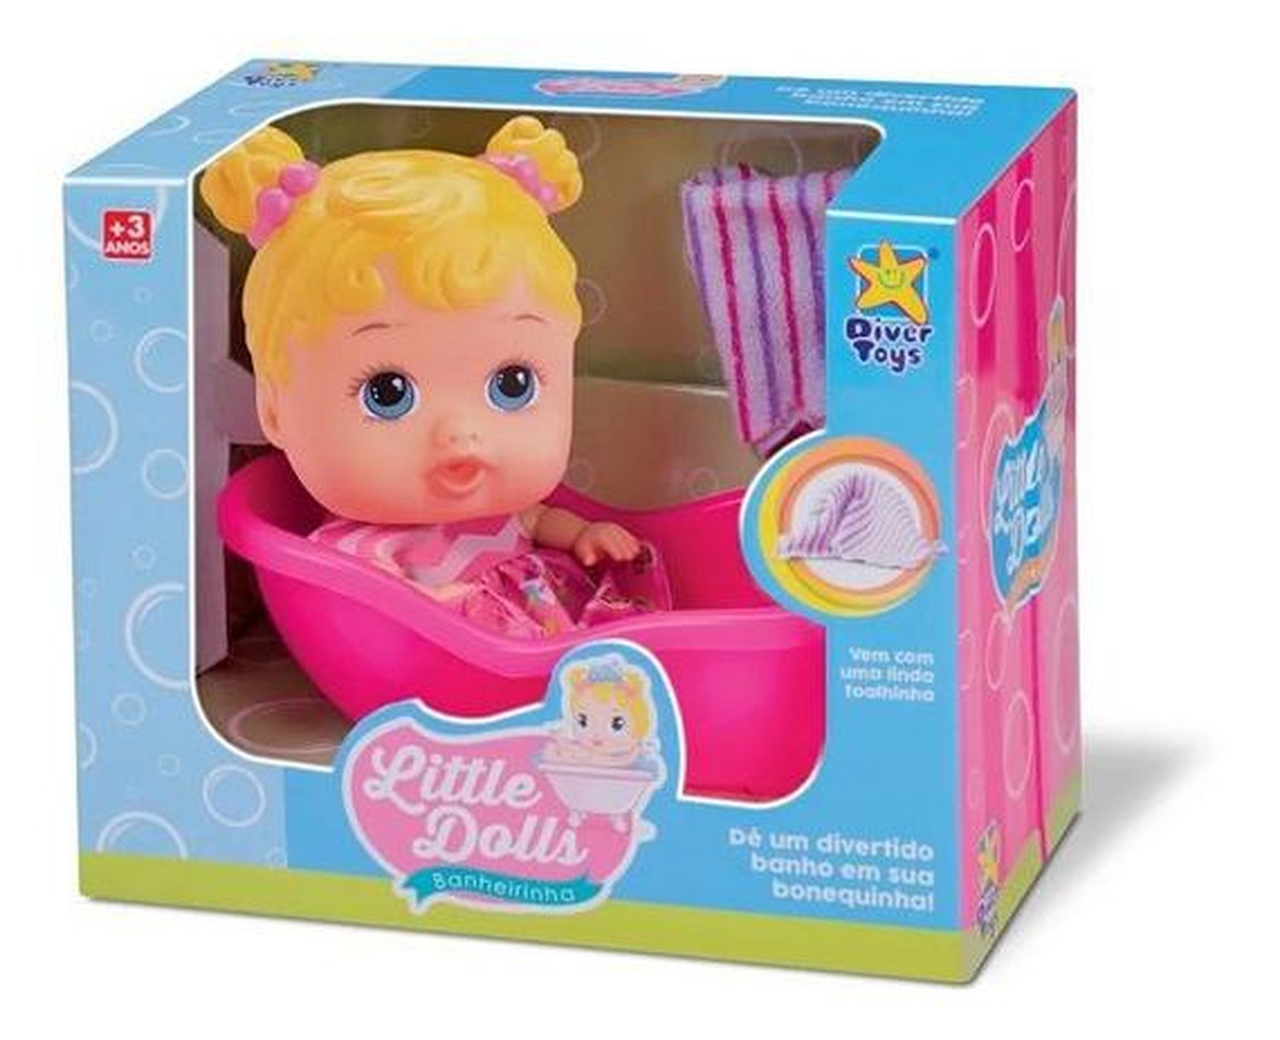 Boneca Little Dolls Banheirinha Loira Divertoys - Ref.: 8022